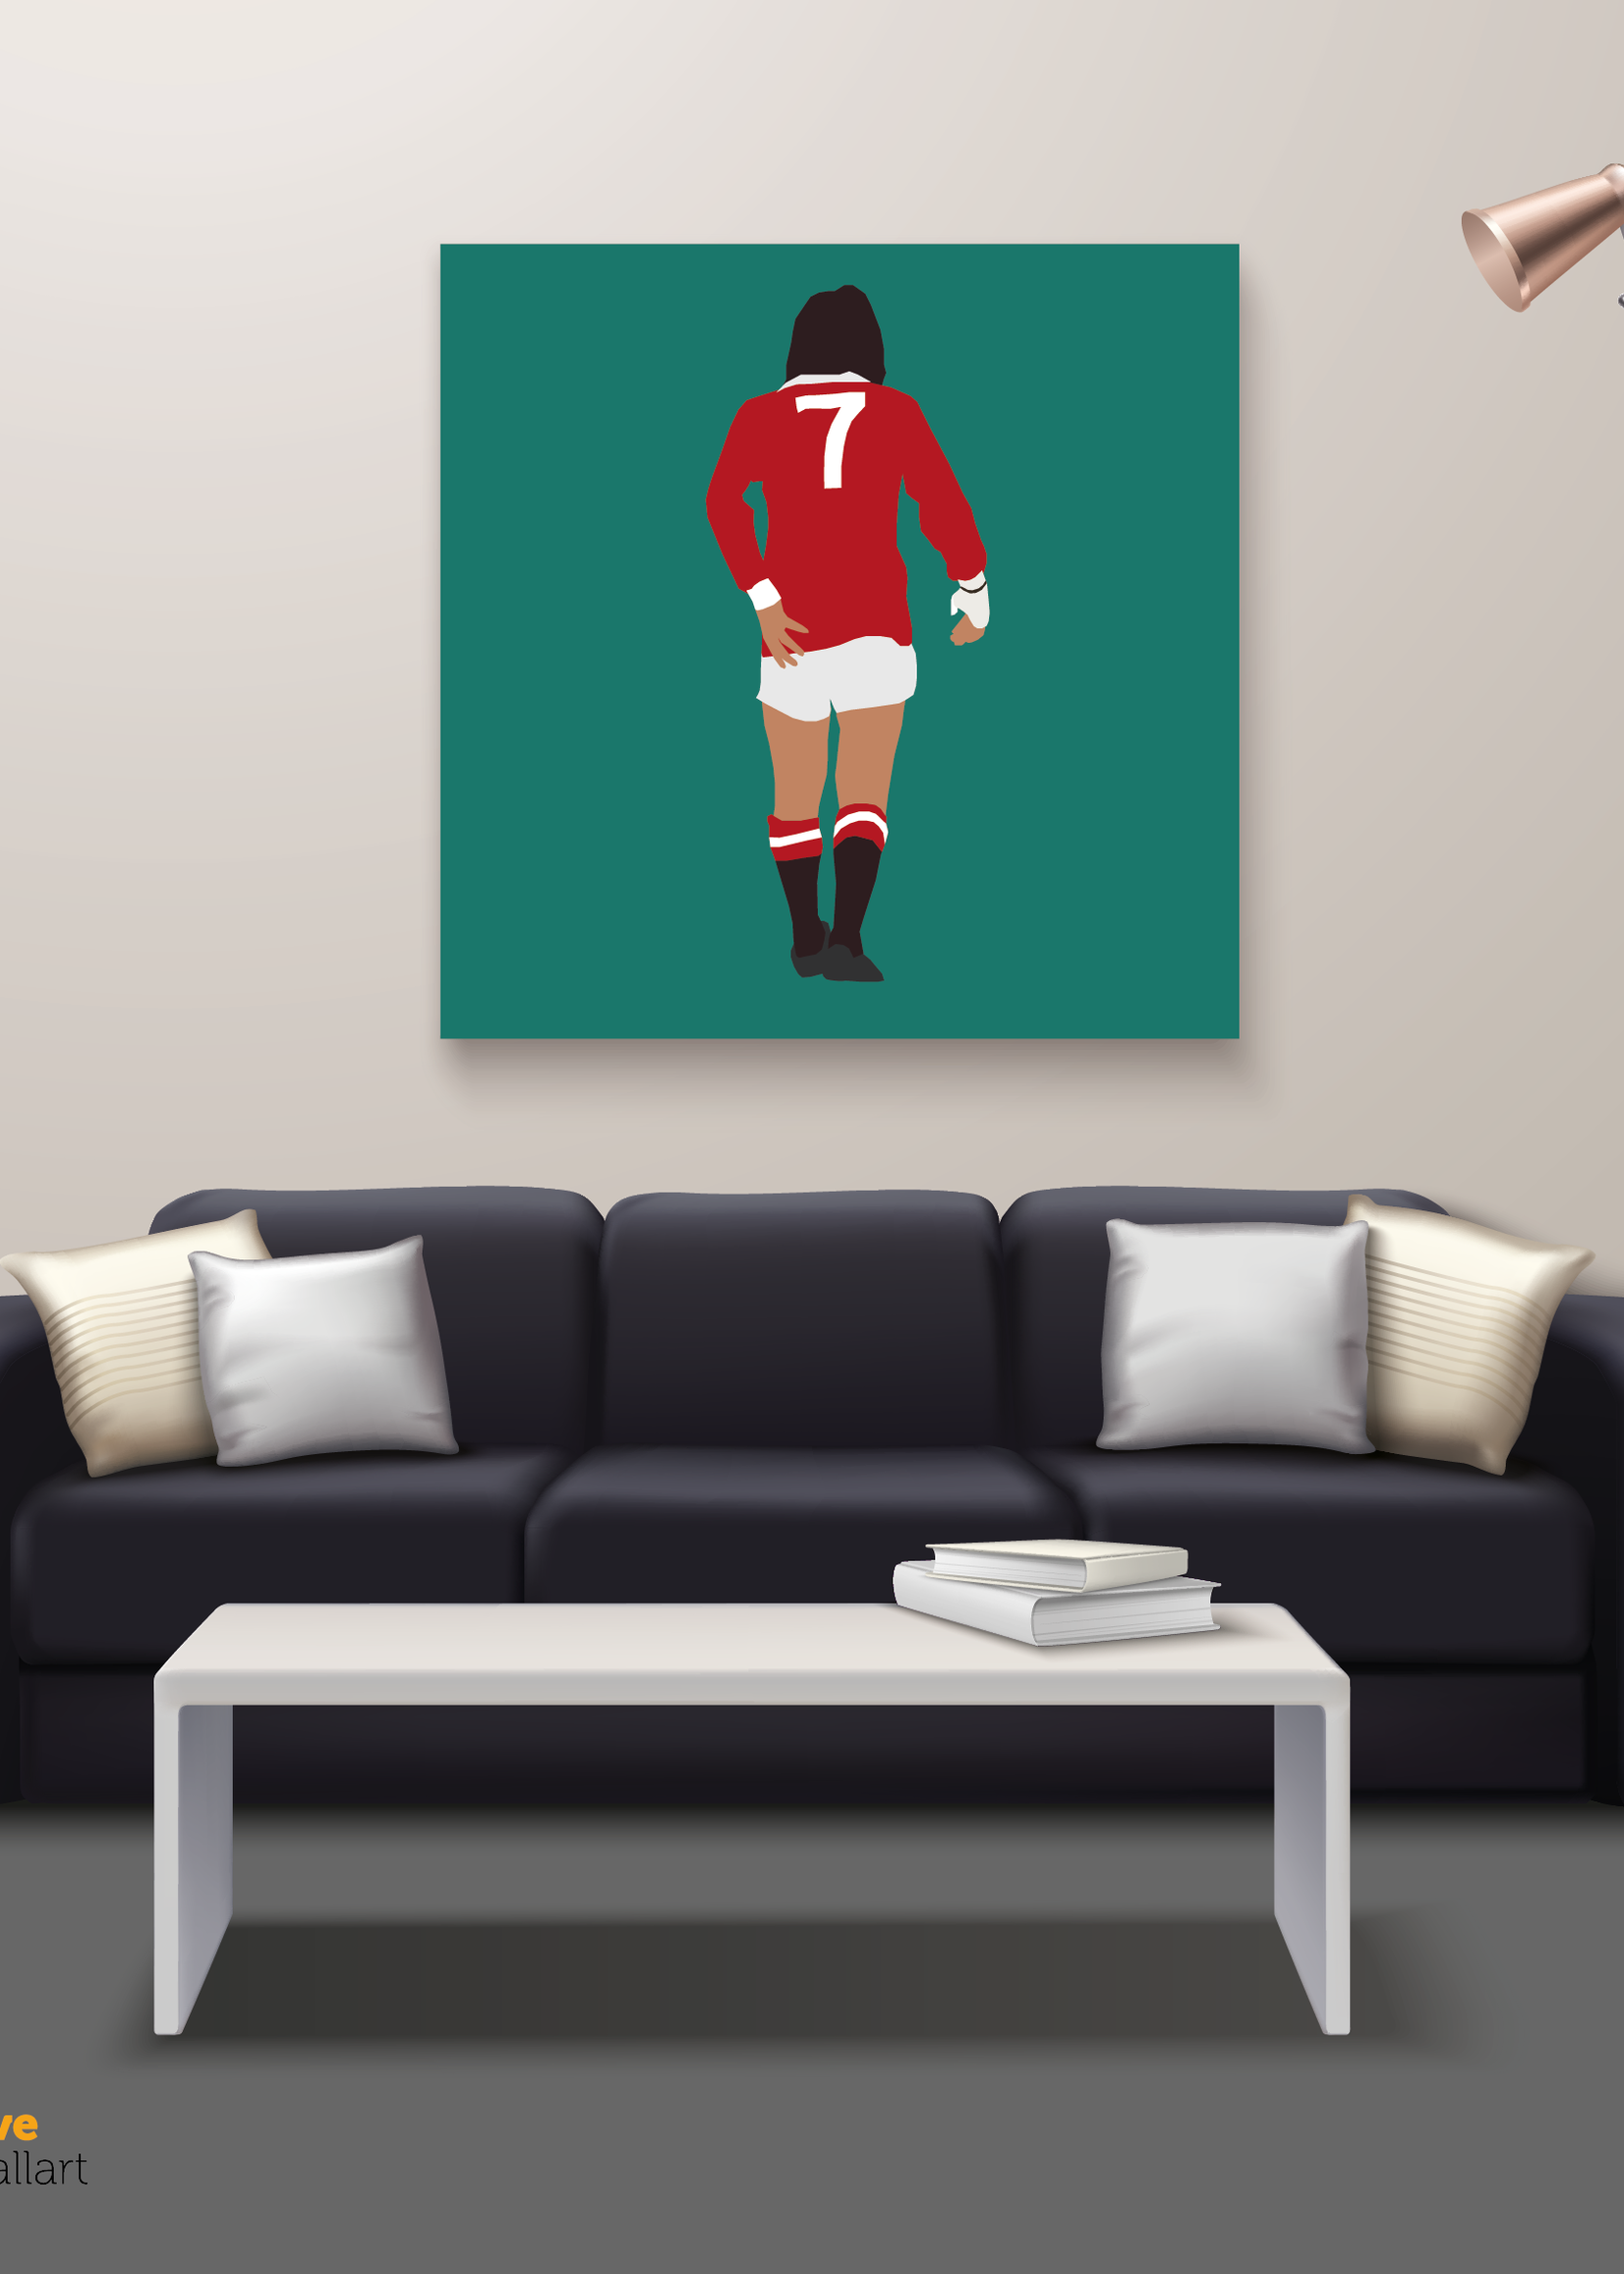 "We Love Football Art ""De vijfde Beatle"" We Love Football Art"